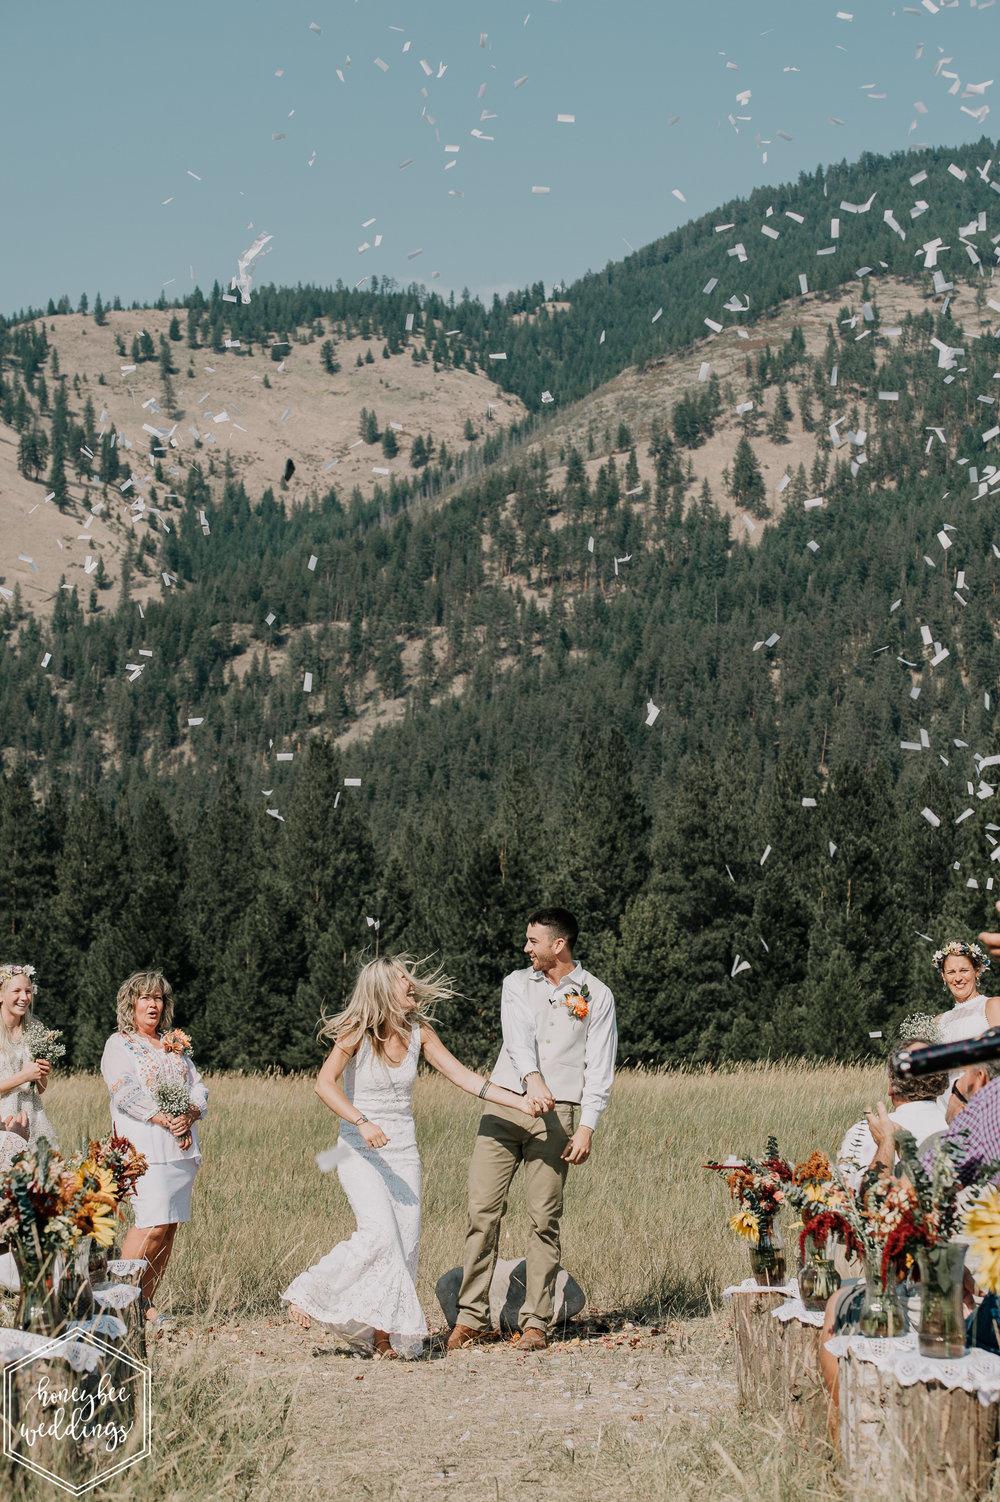 0391Alberton Wedding_Montana Wedding Photographer_Anneliesa Bashaw + Wyatt Zeylawy_August 11, 2018-306.jpg